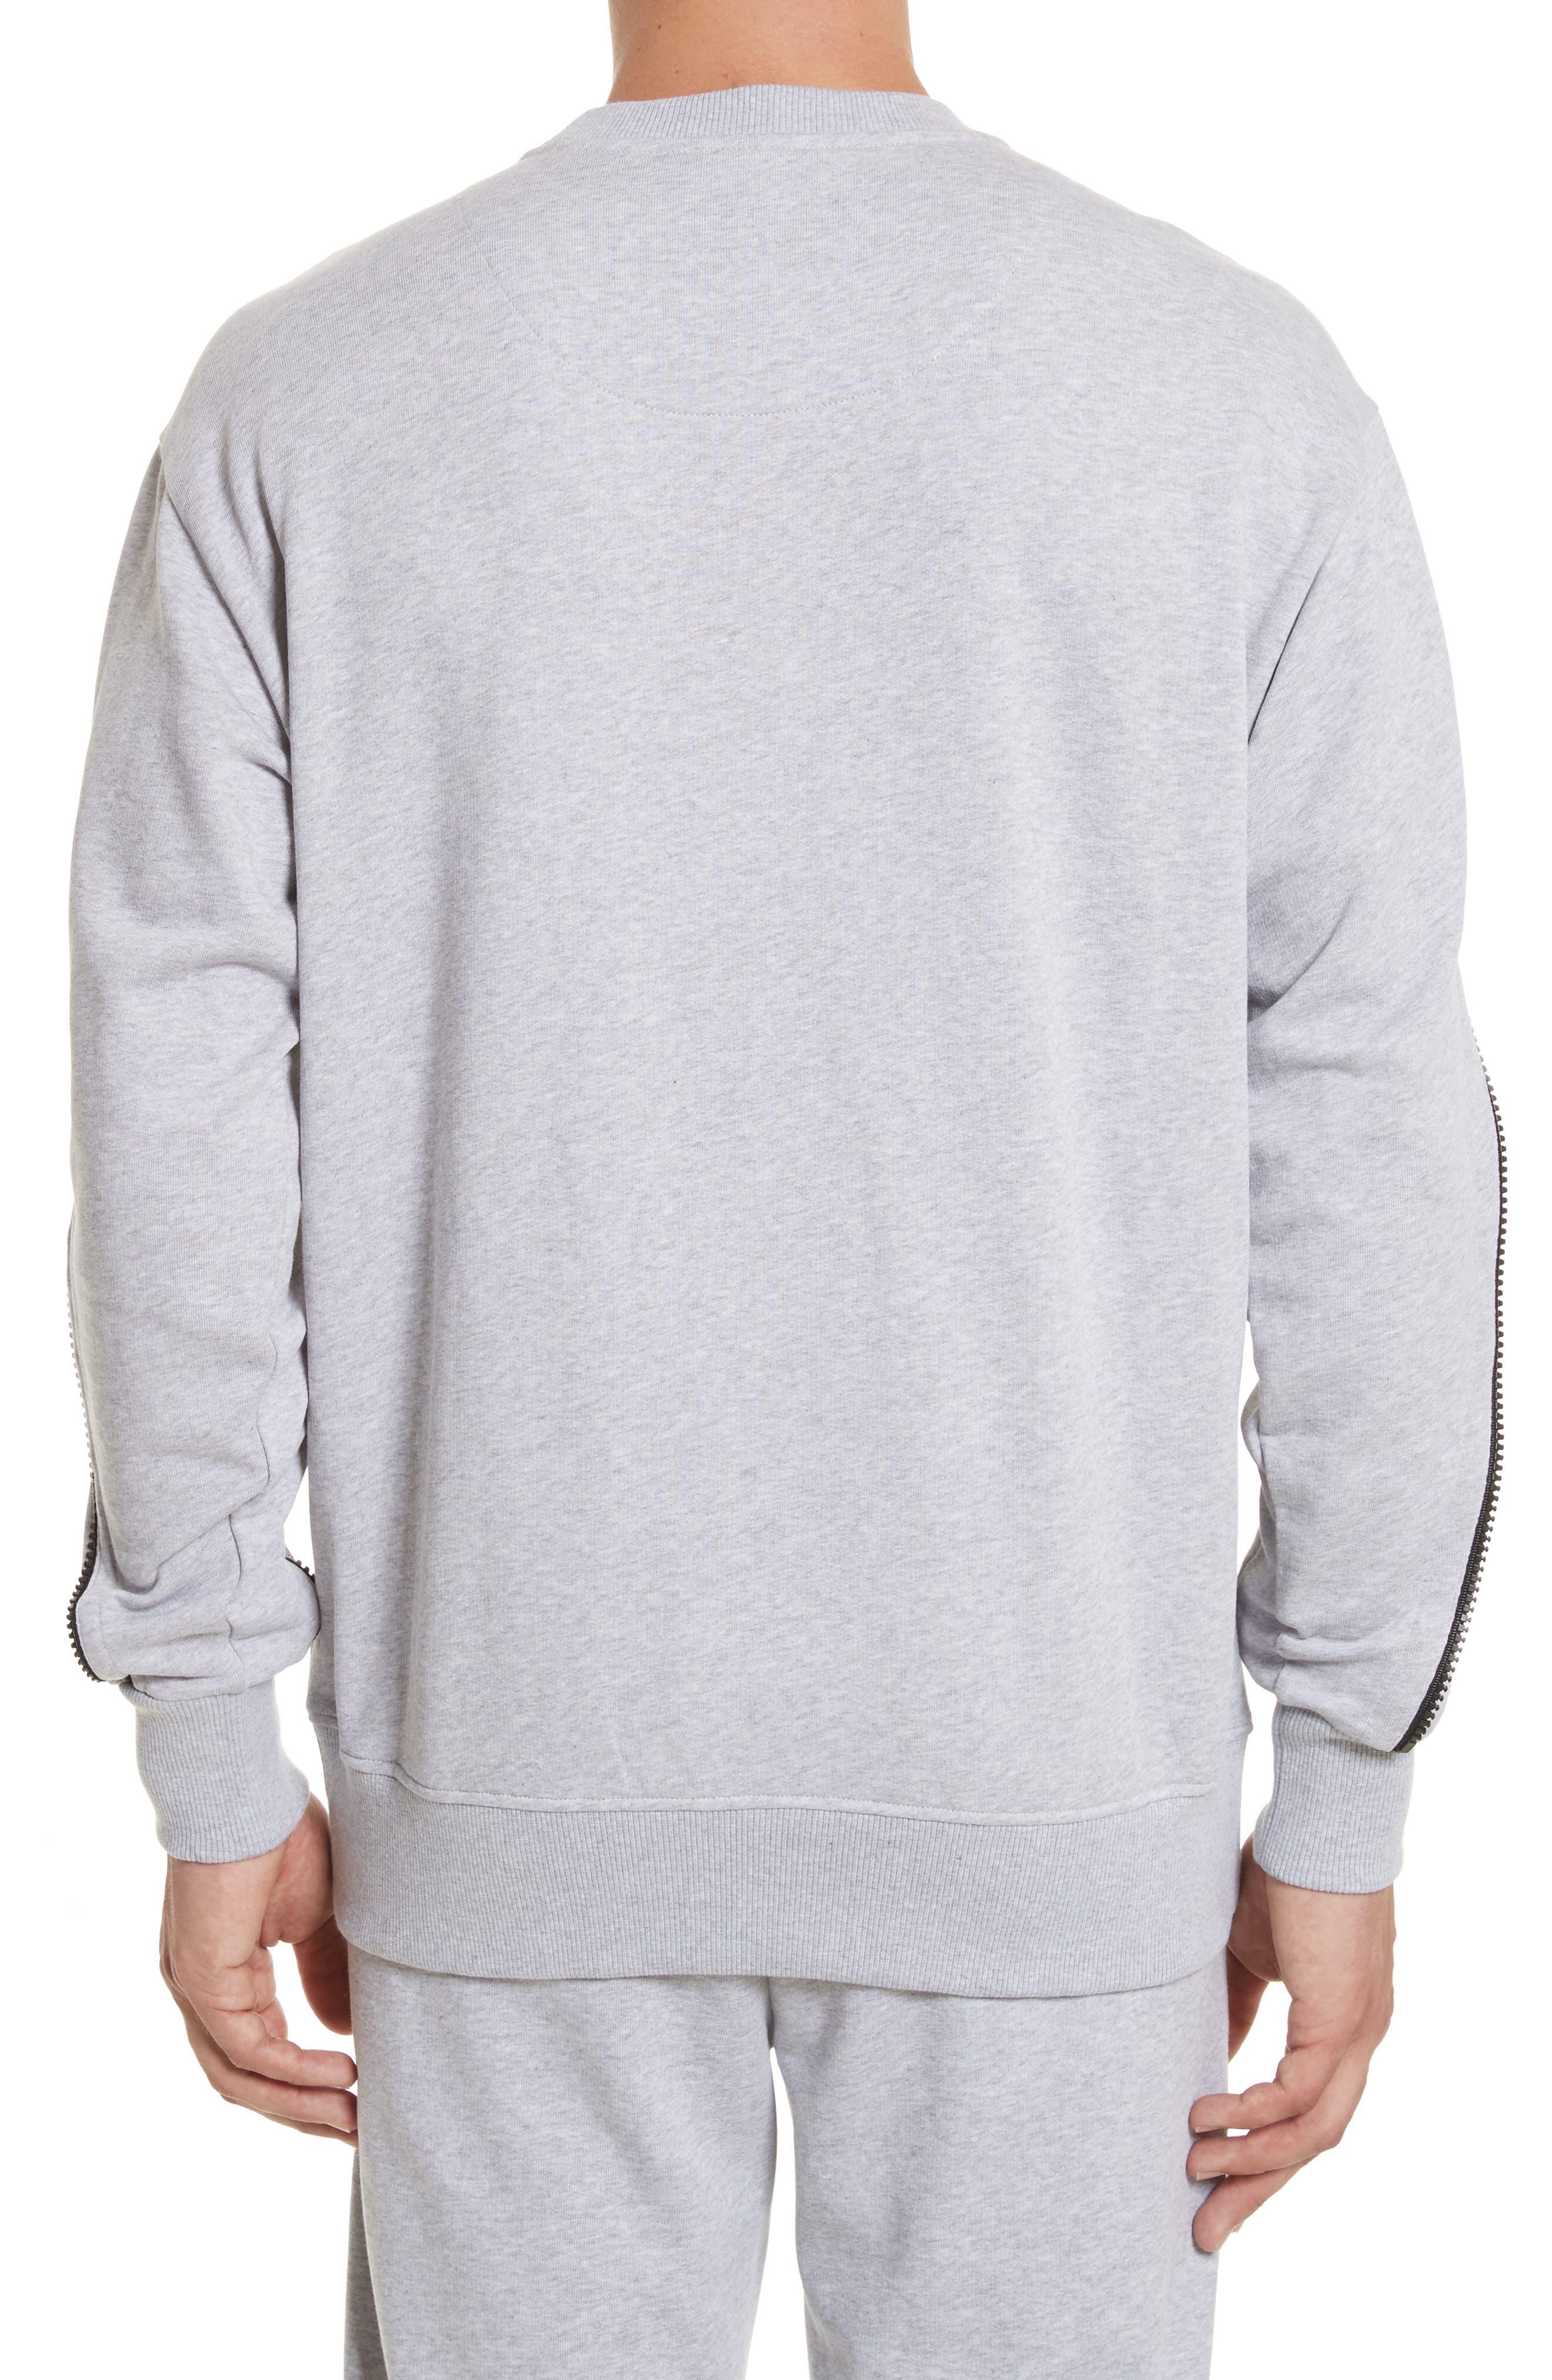 VERSUS by Versace Zip Sleeve Crewneck Sweatshirt,                             Alternate thumbnail 2, color,                             Grey